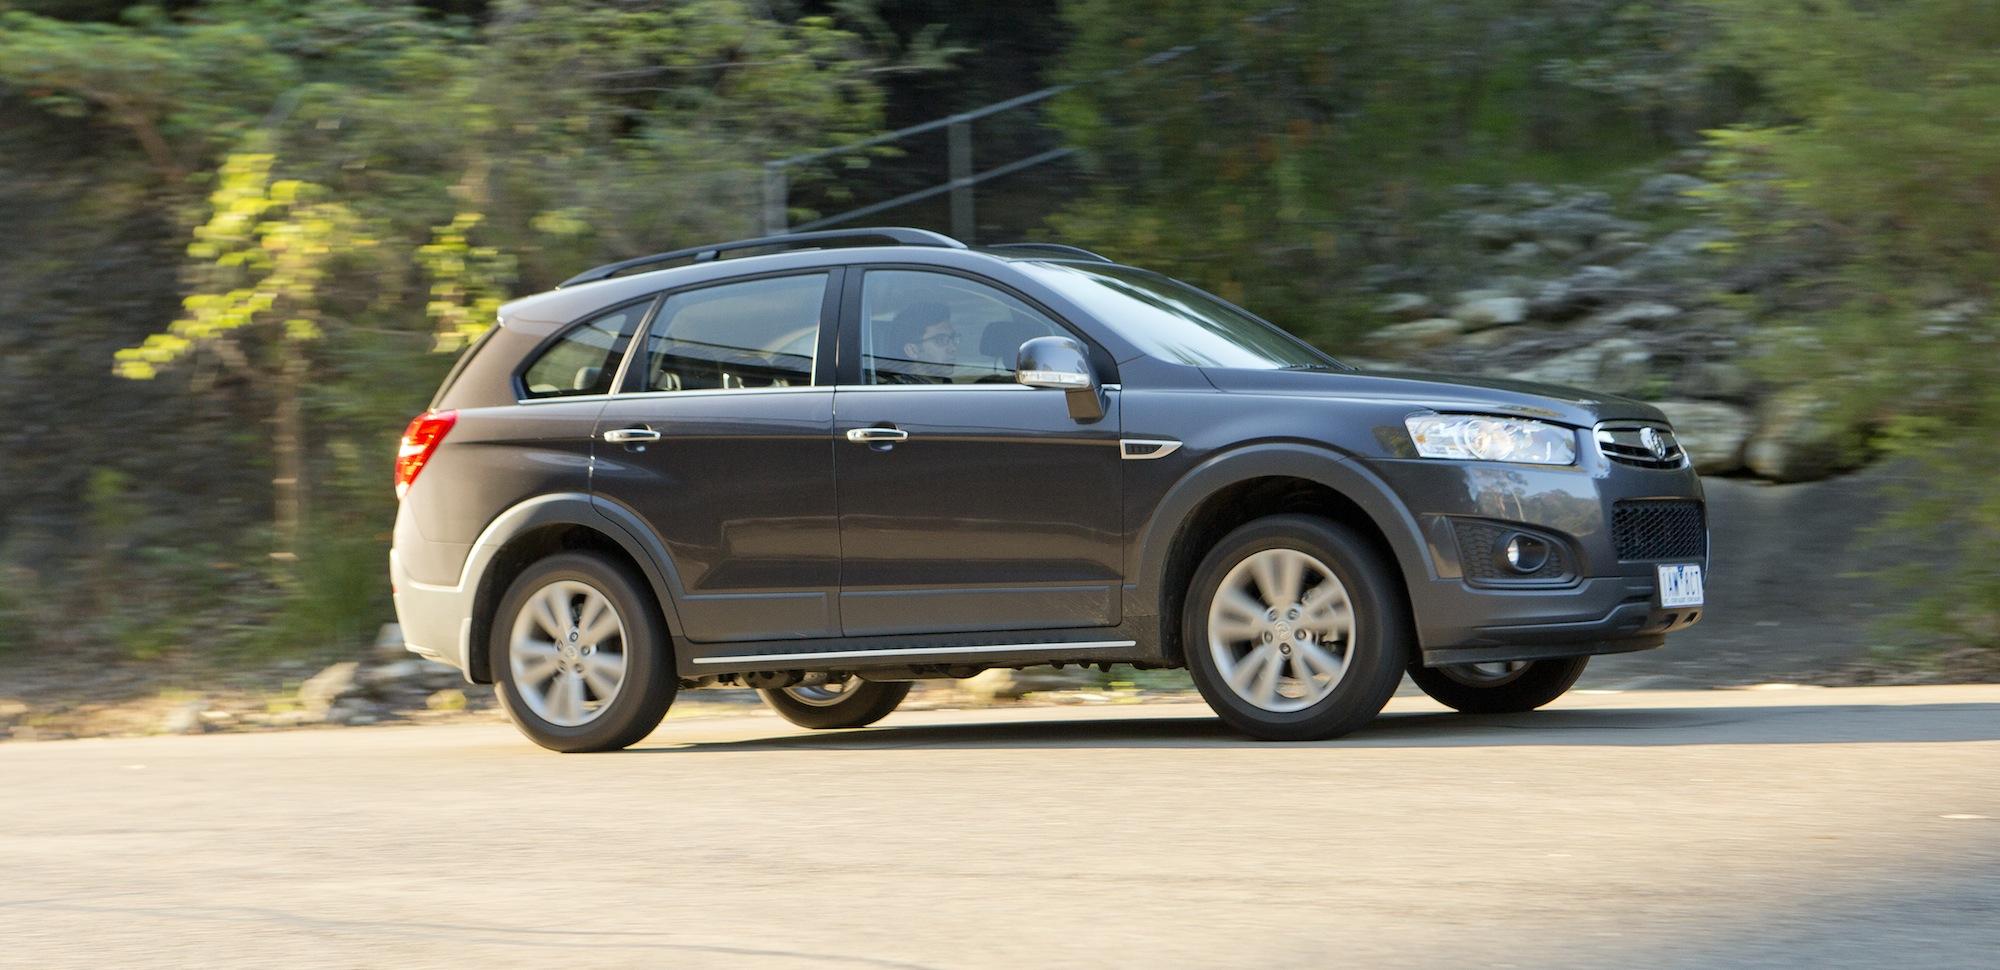 2014 Holden Captiva 7 Lt (AWD) Review   CarAdvice